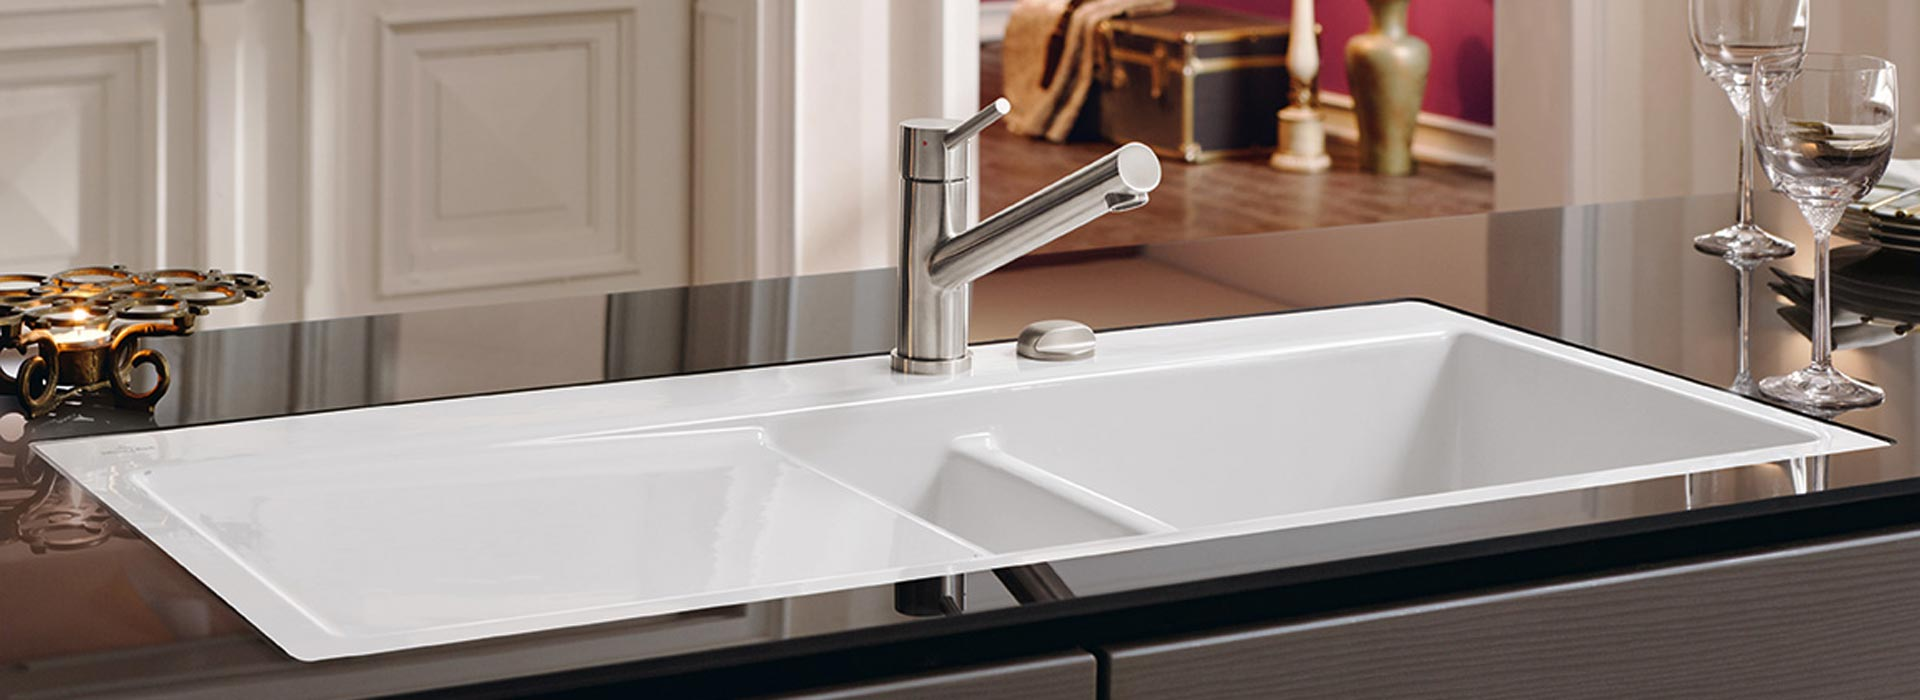 Top-class flush-mounted sink from Villeroy & Boch